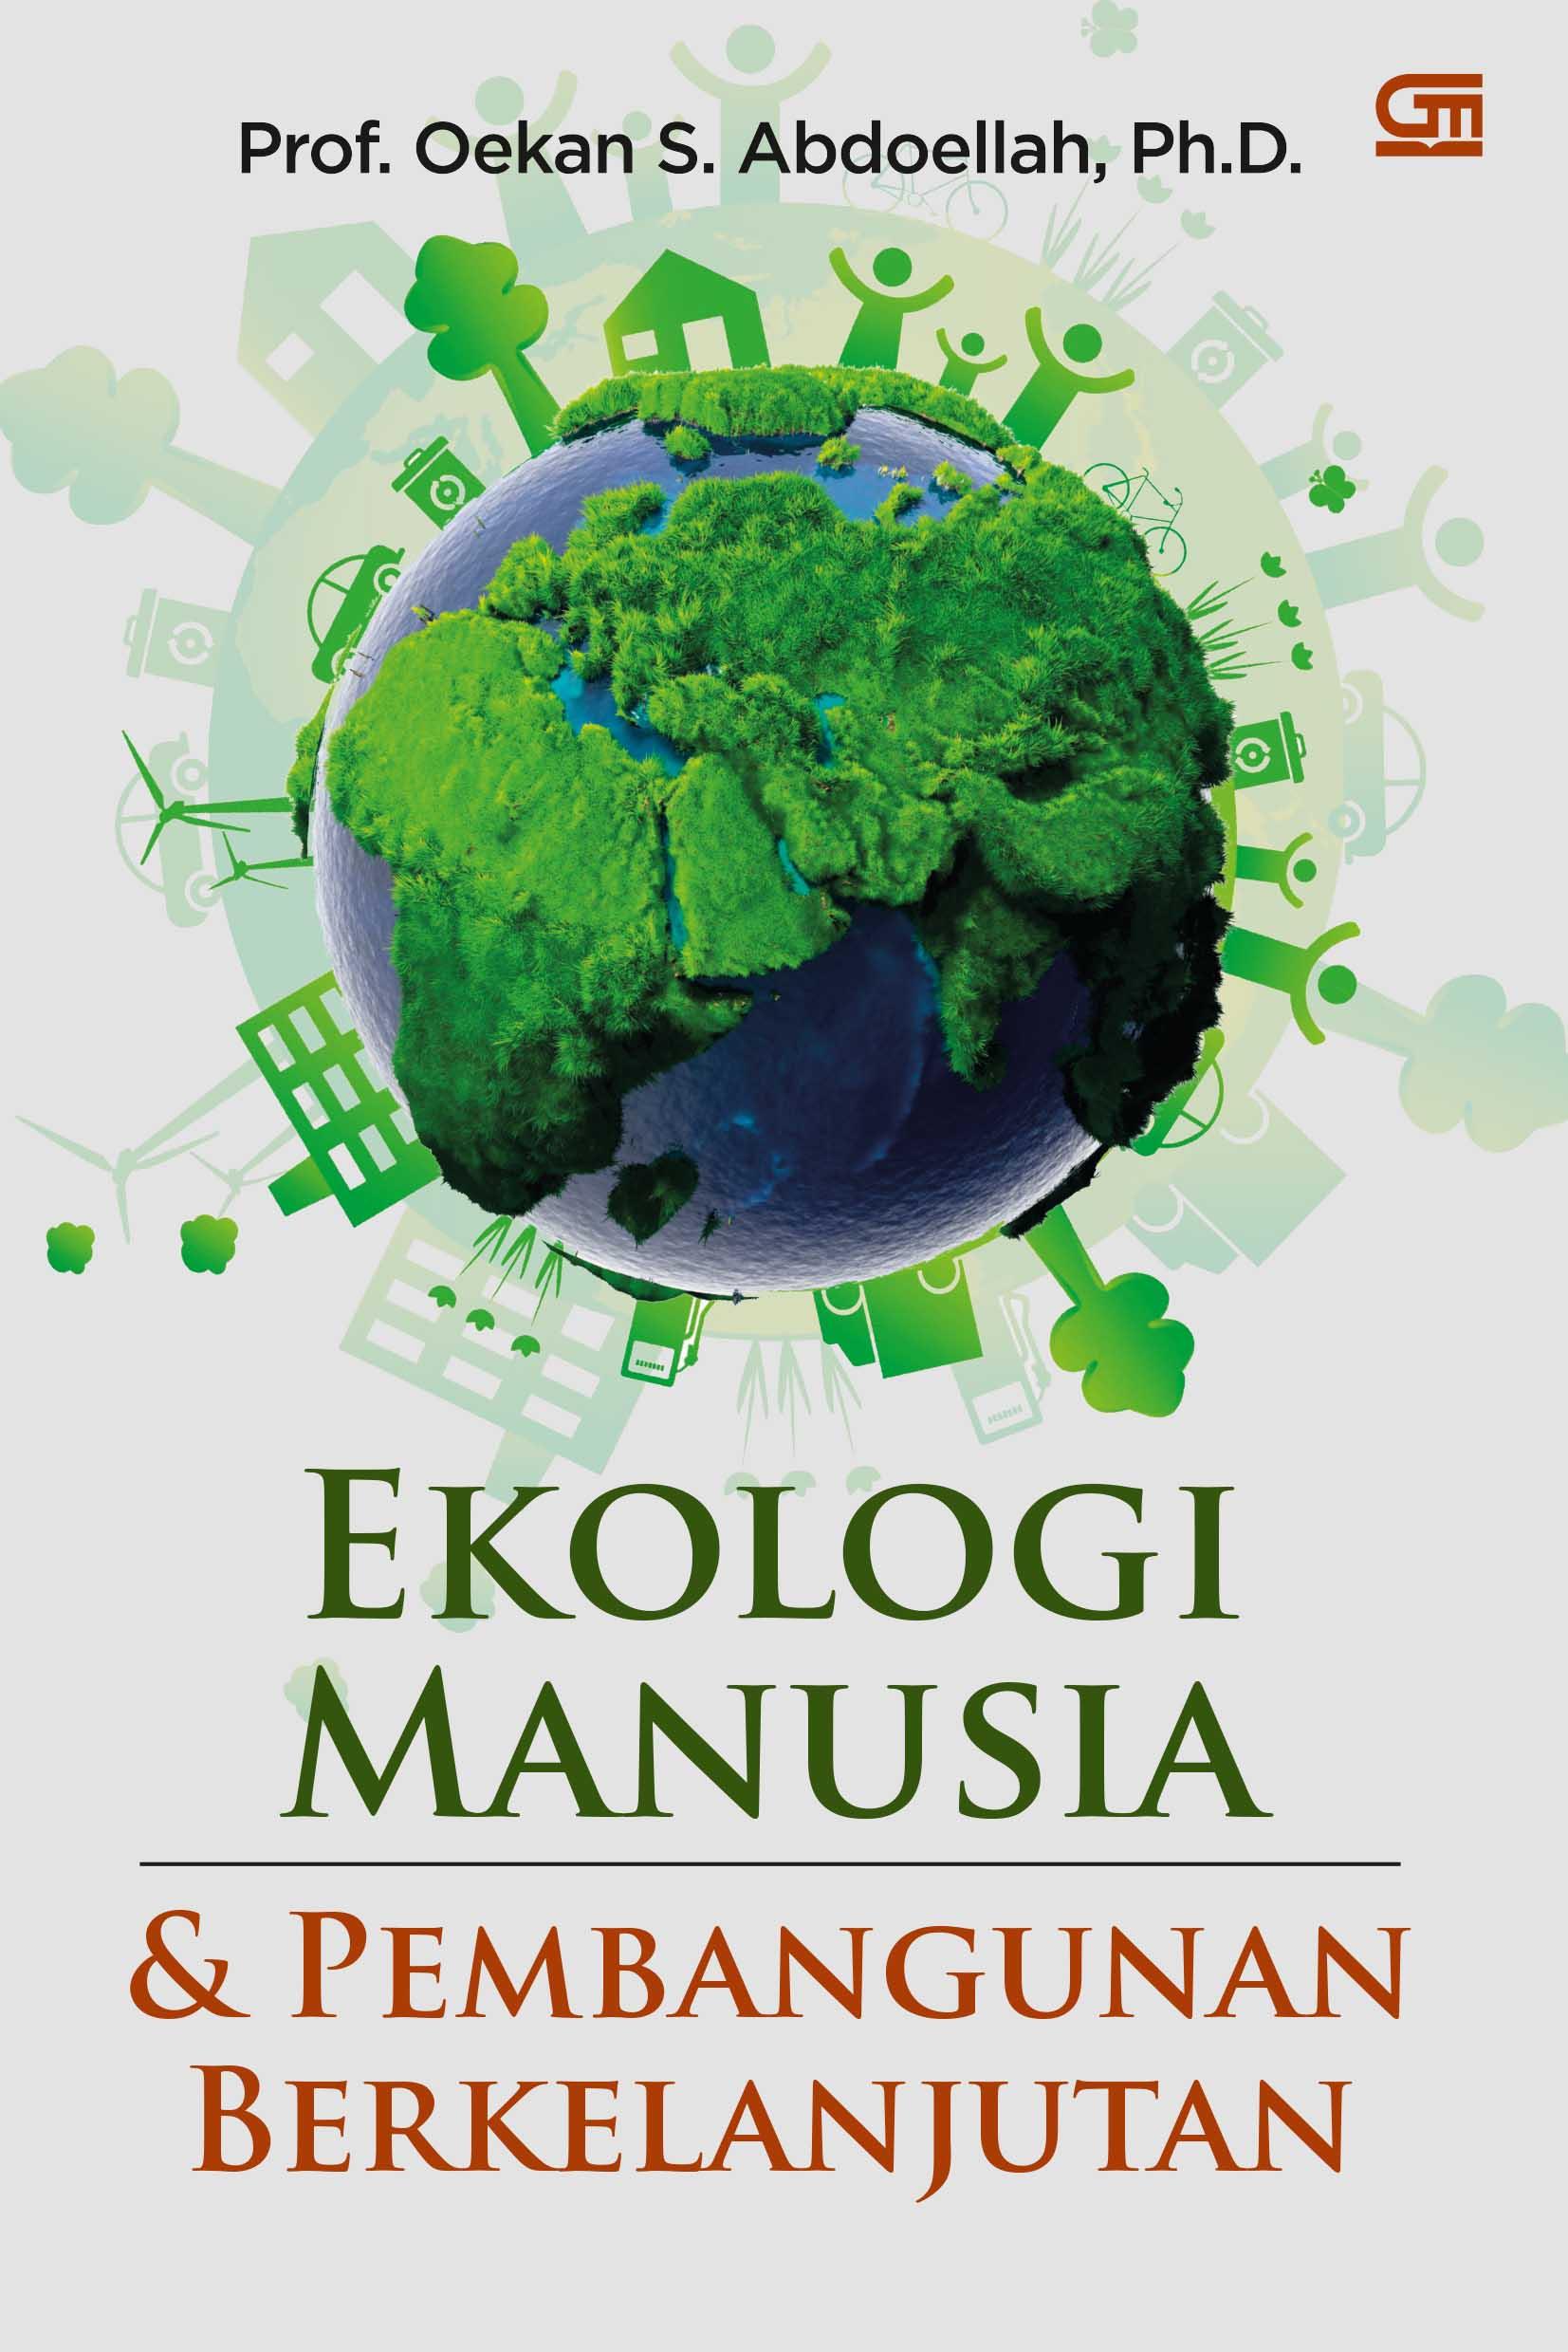 Ekologi Manusia dan Pembangunan Berkelanjutan